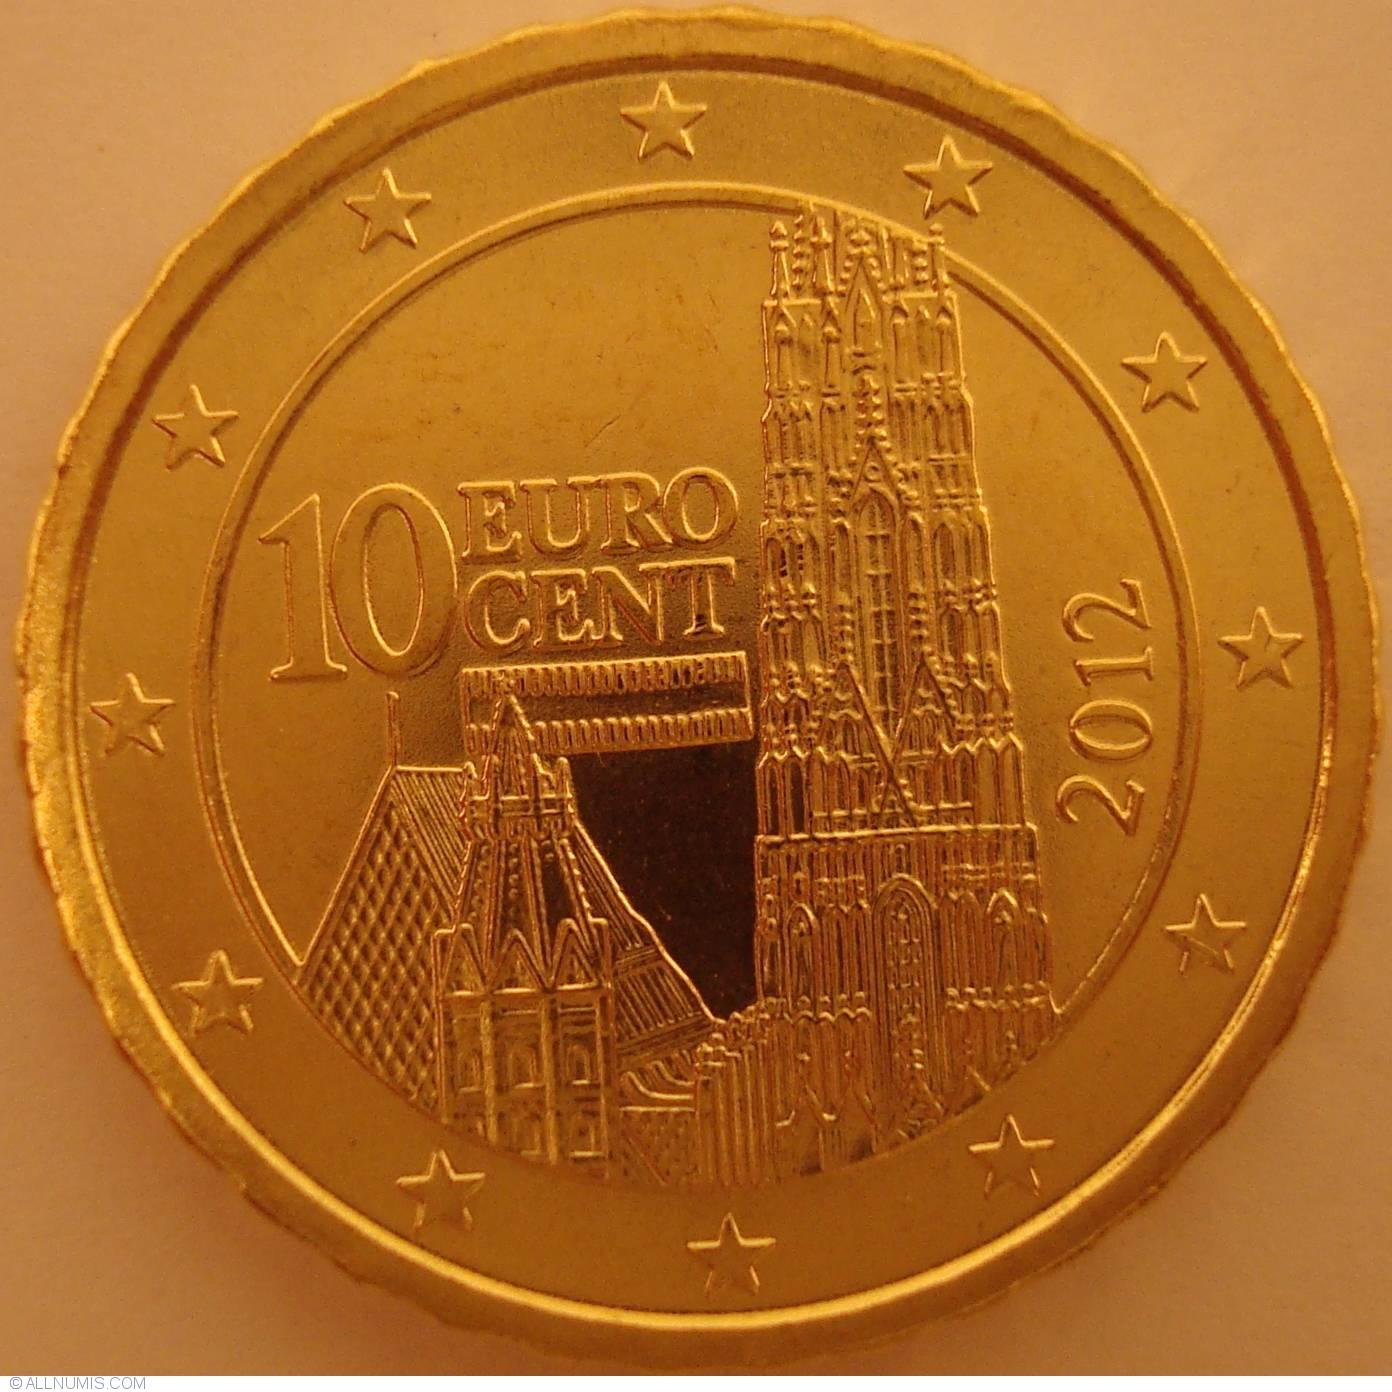 10 euro cent 2012 euro 2010 2019 austria coin 26832. Black Bedroom Furniture Sets. Home Design Ideas